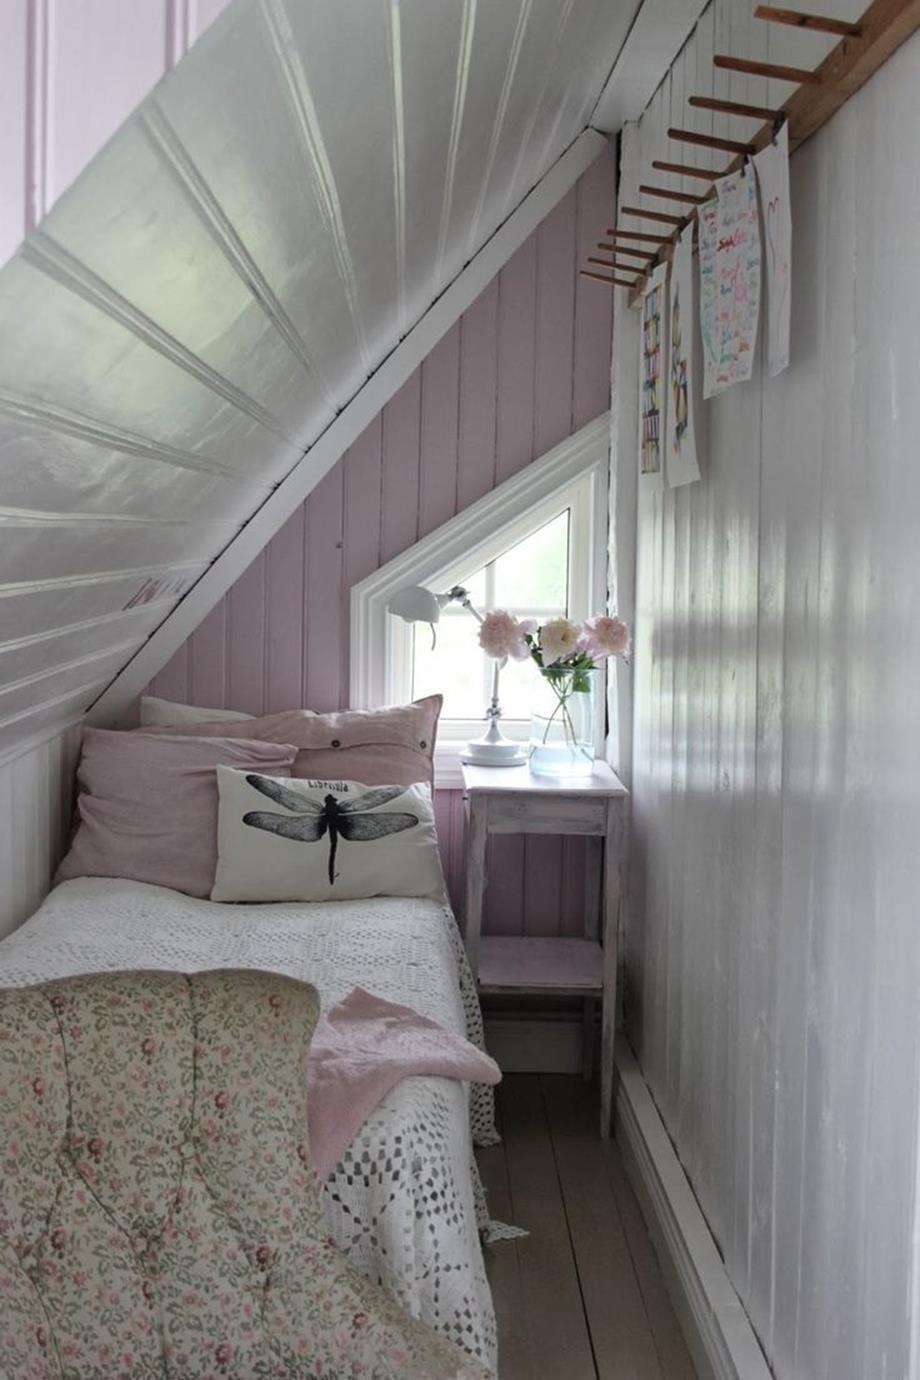 28 Inspiring Small Attic Room Ideas - Go DIY Home   Very ...